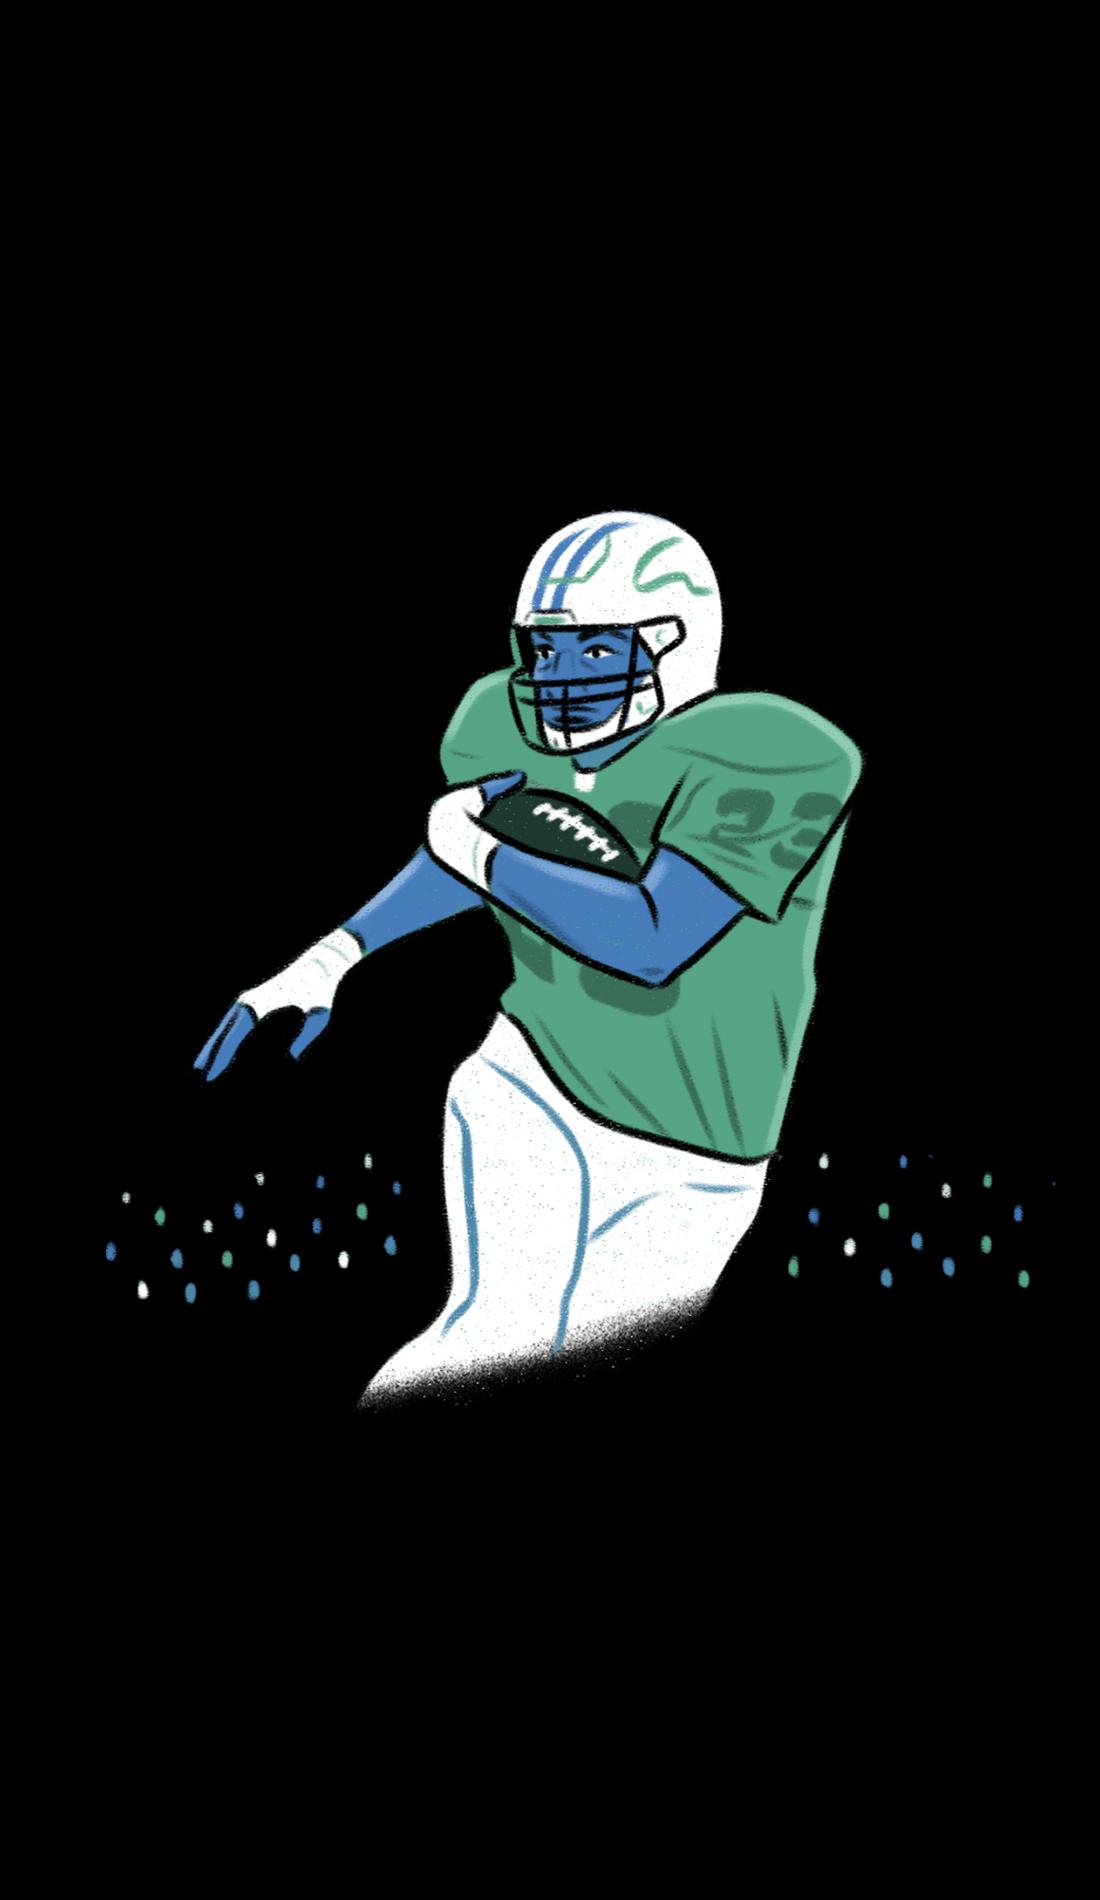 A Mac Football Championship live event